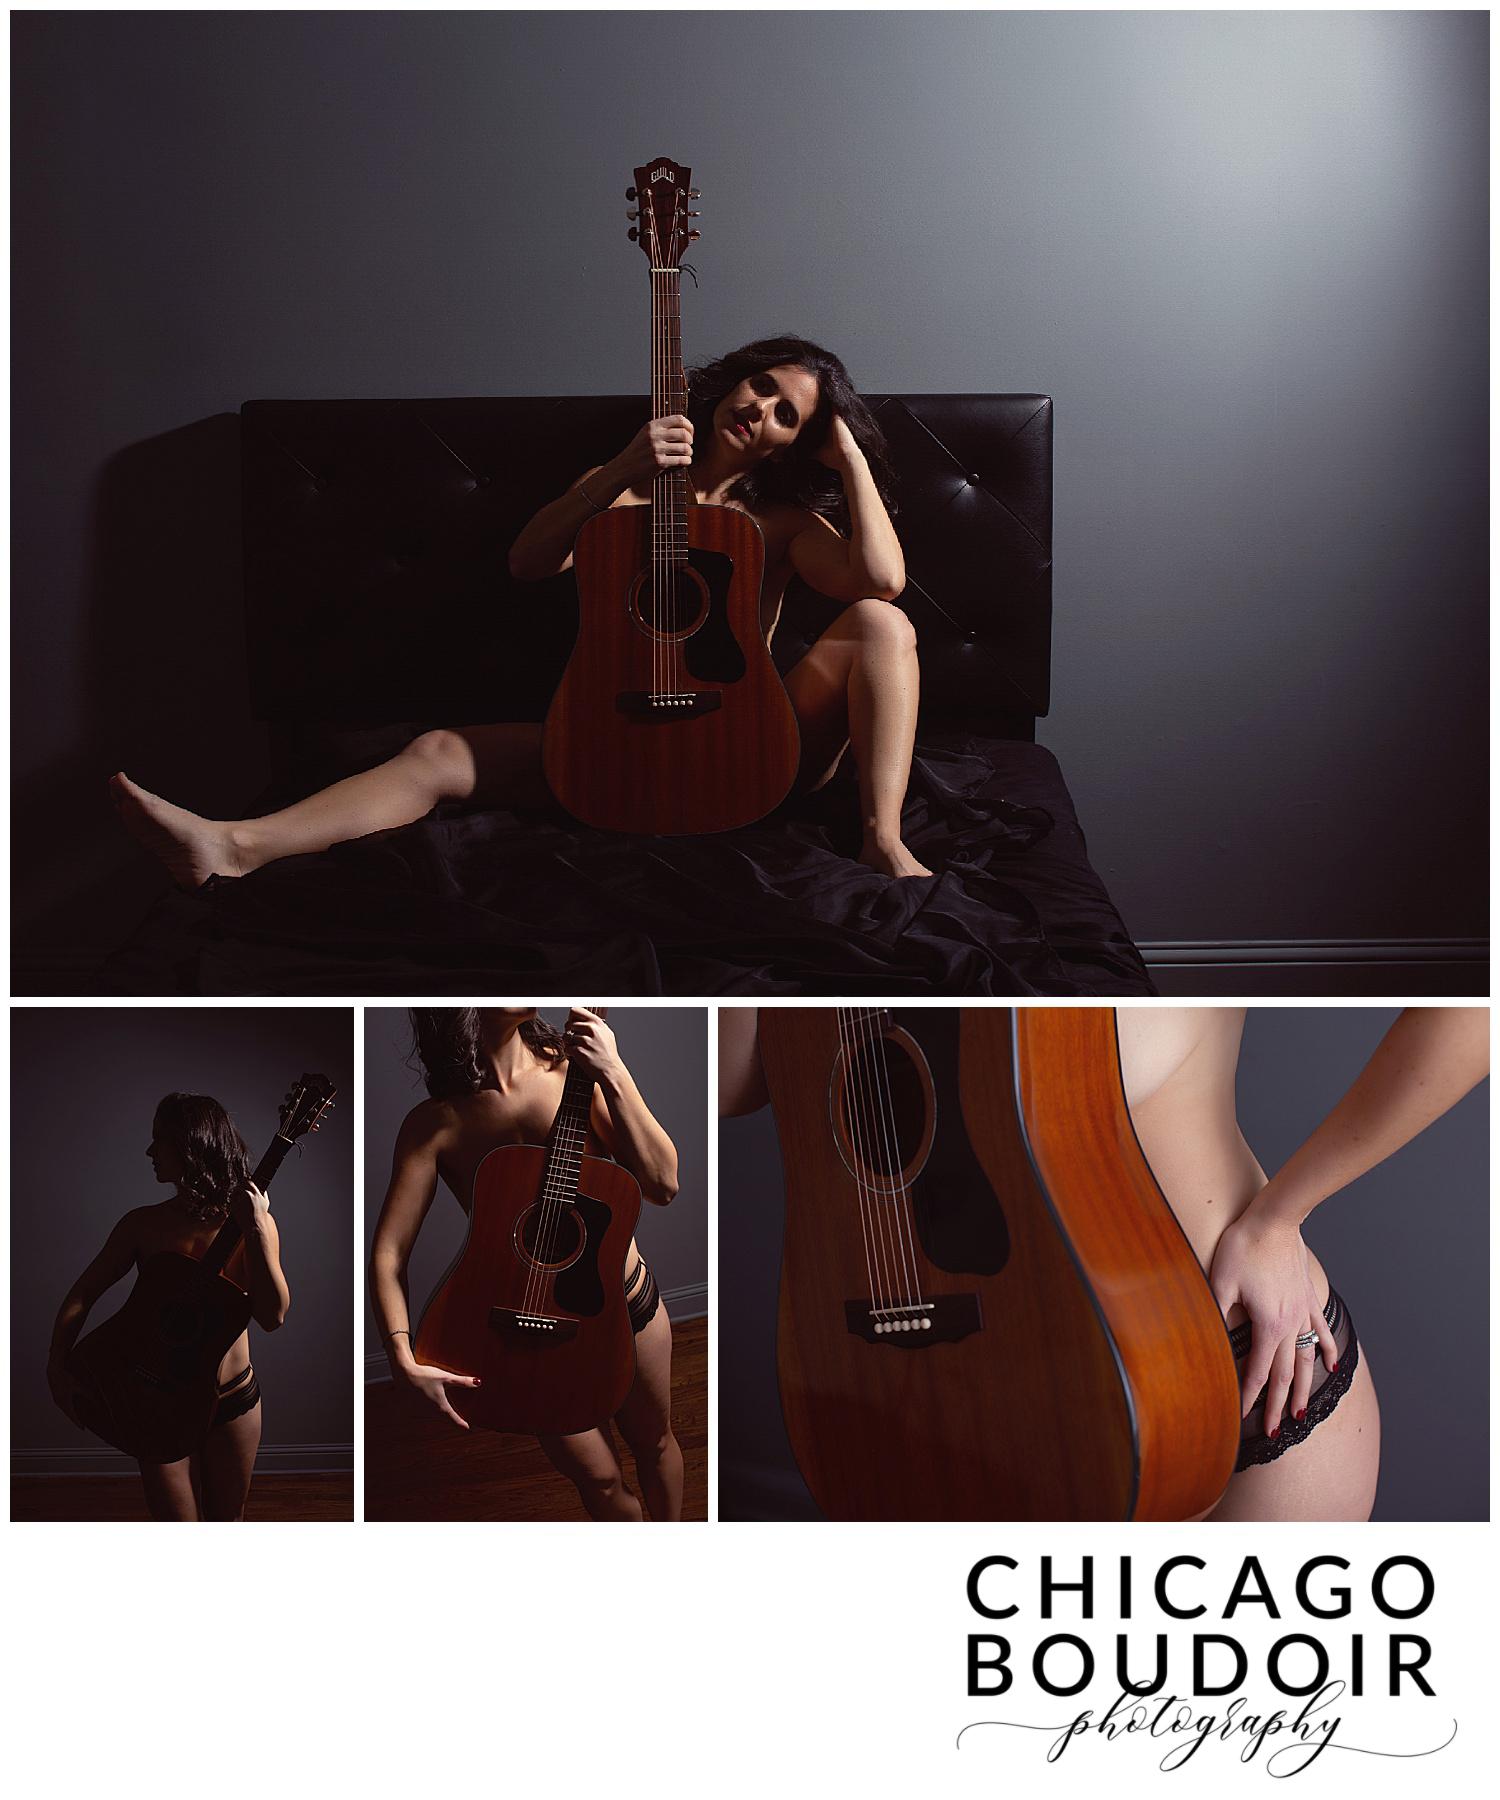 chicago-boudoir-photography.jpg